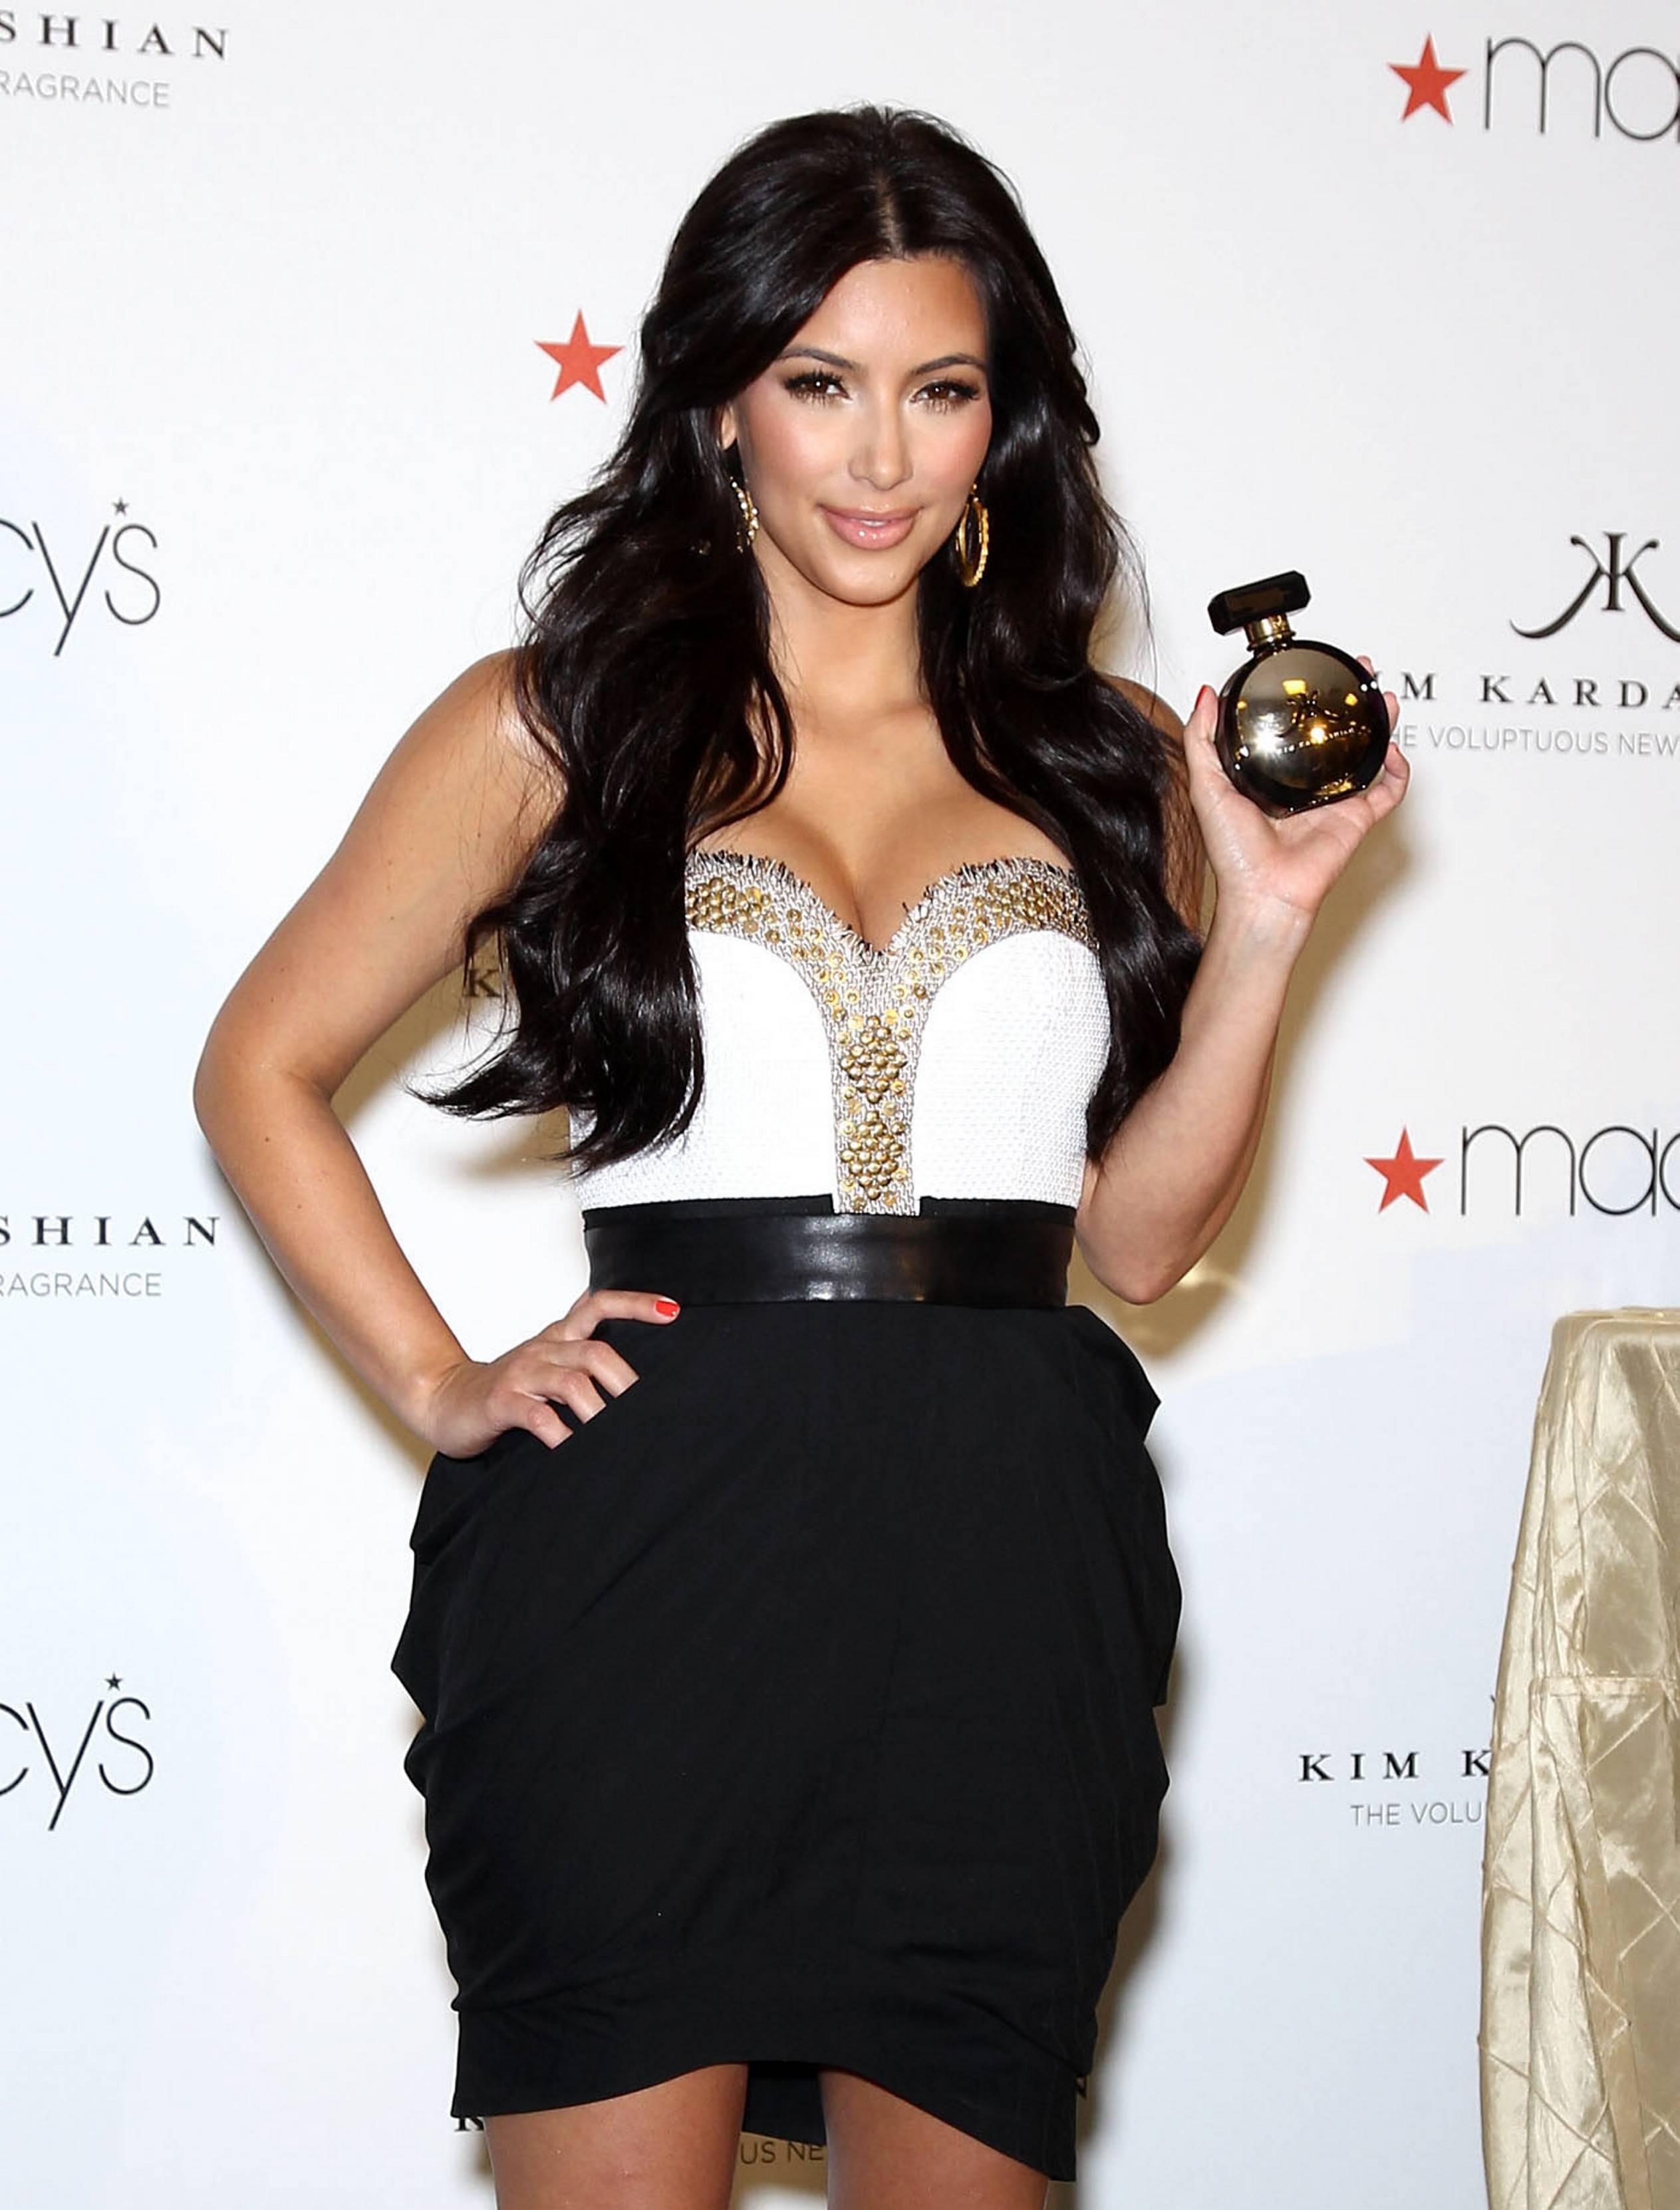 84879_celebrity_paradise.com_Kim_Kardashian_Fragance_03_122_105lo.jpg